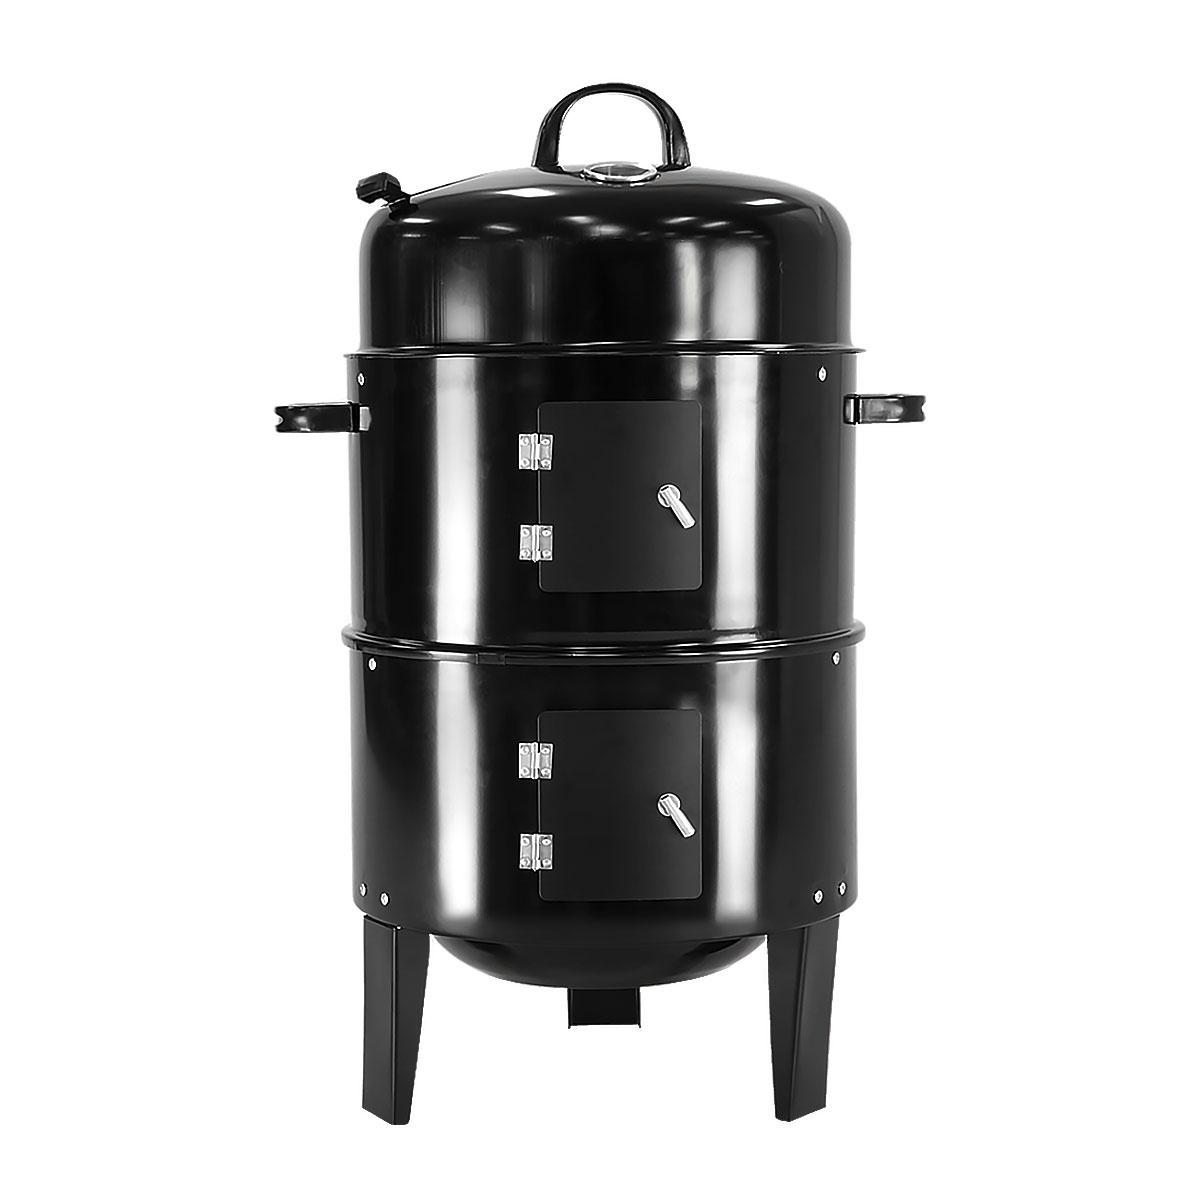 Wallaroo 3-in-1 Charcoal BBQ Smoker